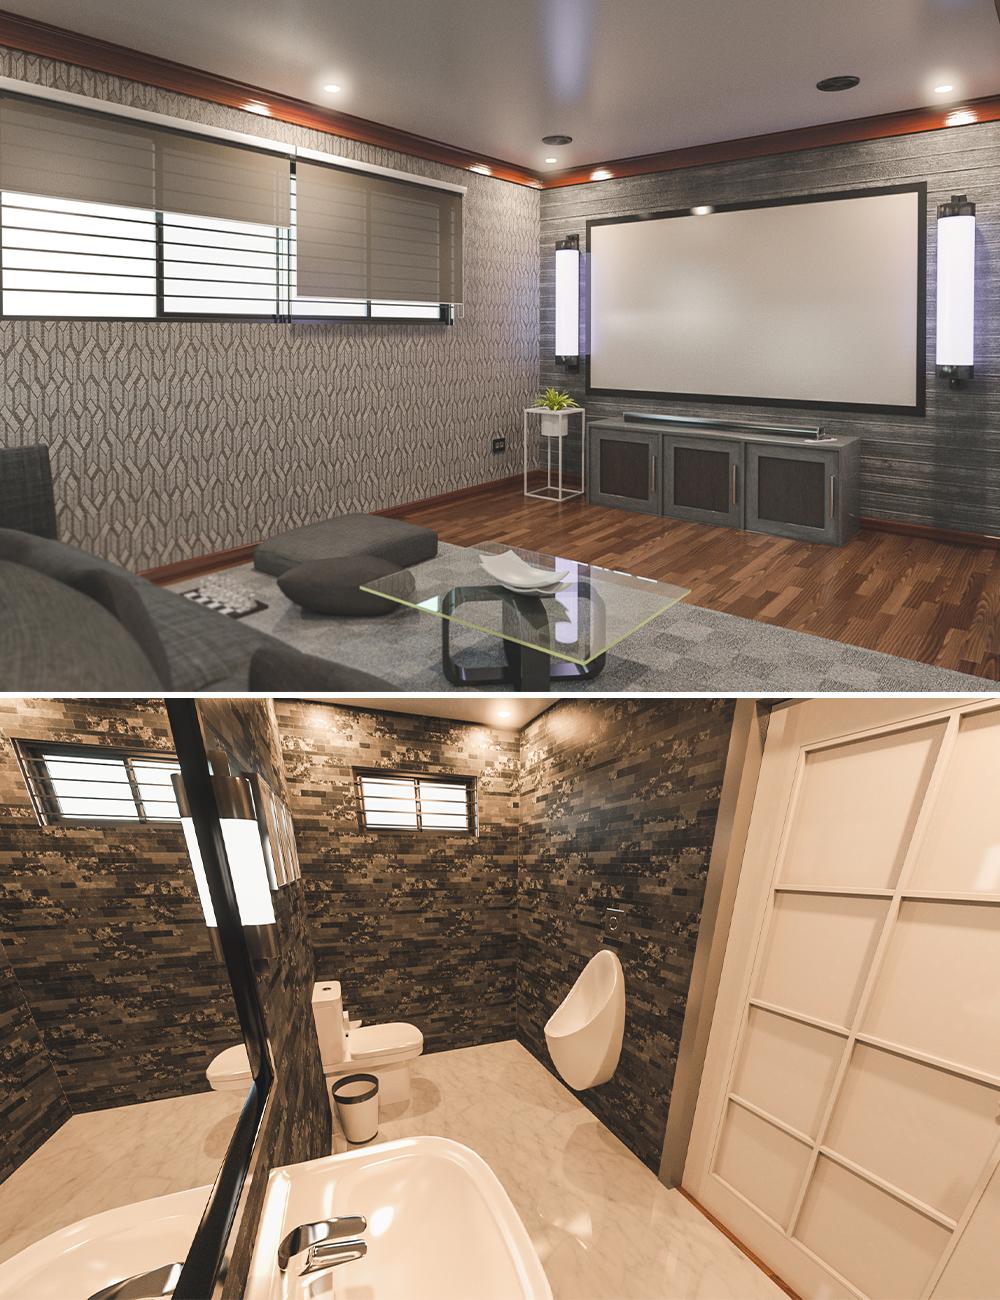 Avil Entertainment Room by: Tesla3dCorp, 3D Models by Daz 3D